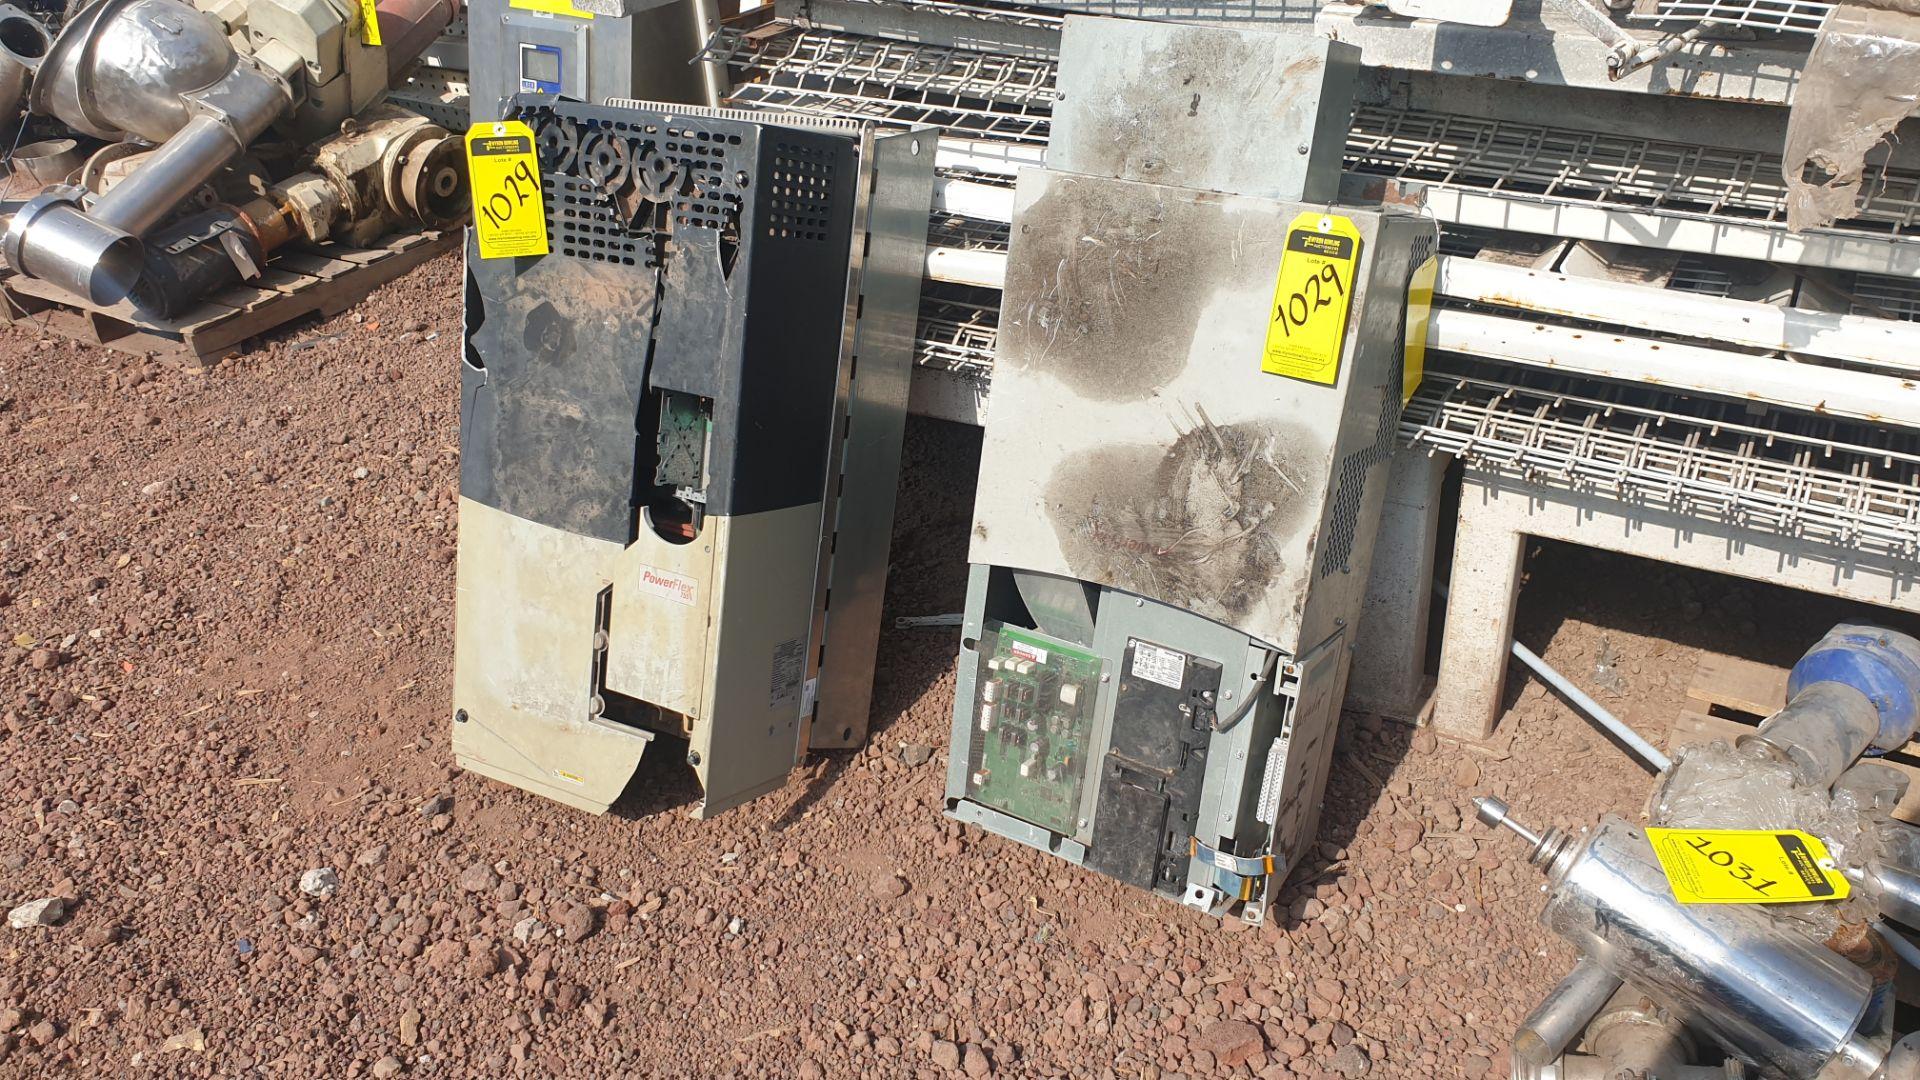 2 Powerflex Variator boards, model 20G1AN, 20BD180A0AYNANC0